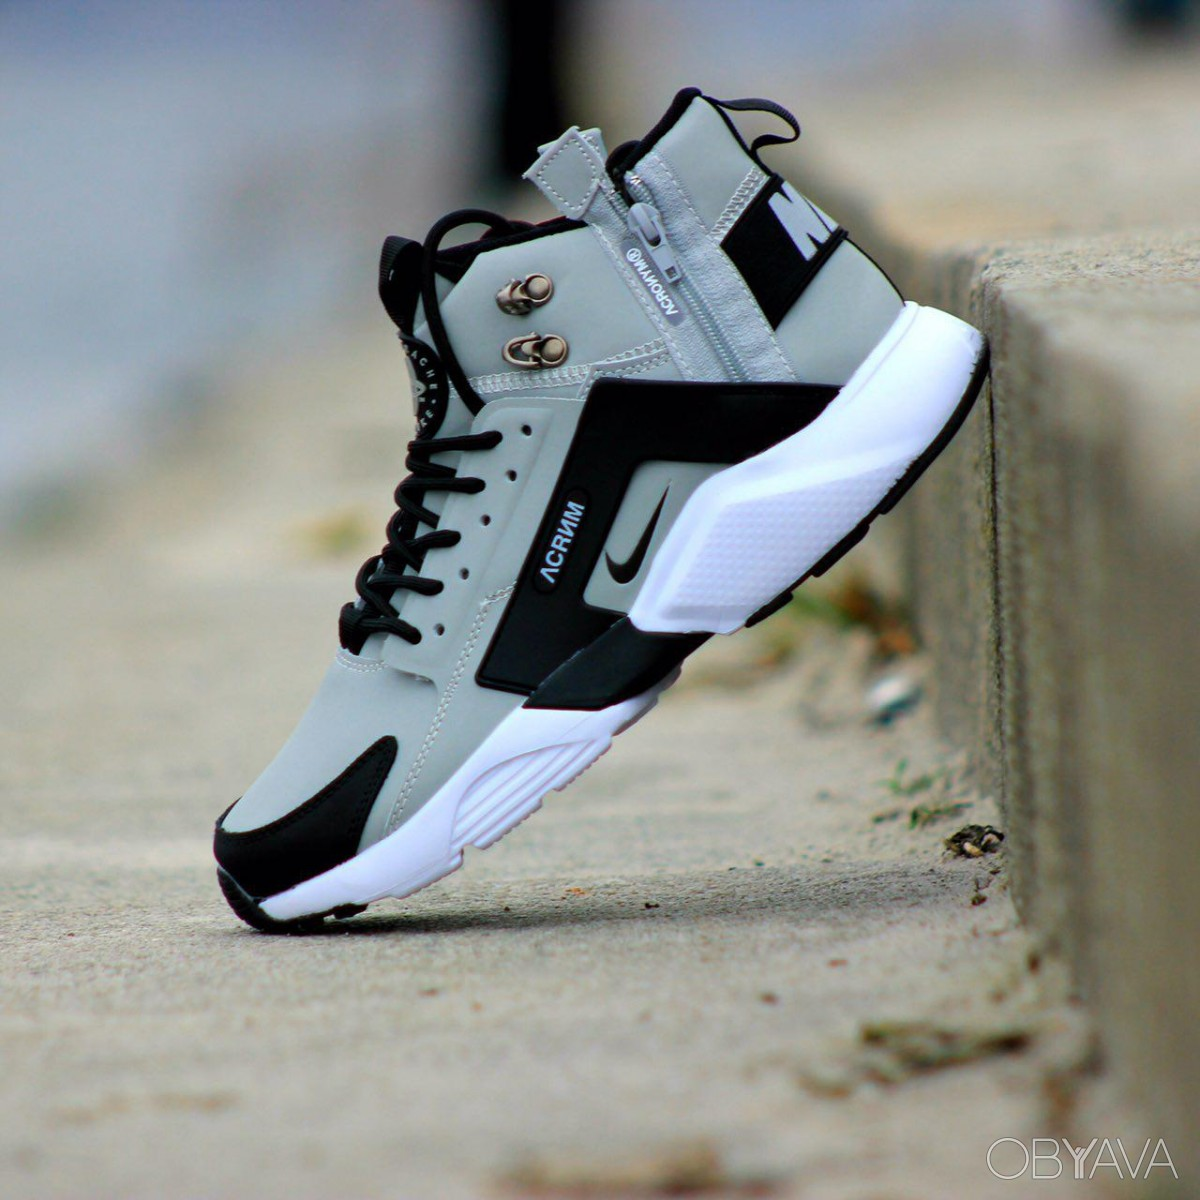 new style 035a1 91729 ᐈ Кроссовки Nike Huarache Winter Acronym ᐈ Киев 1500 ГРН - OBYAVA.ua™  №2314969